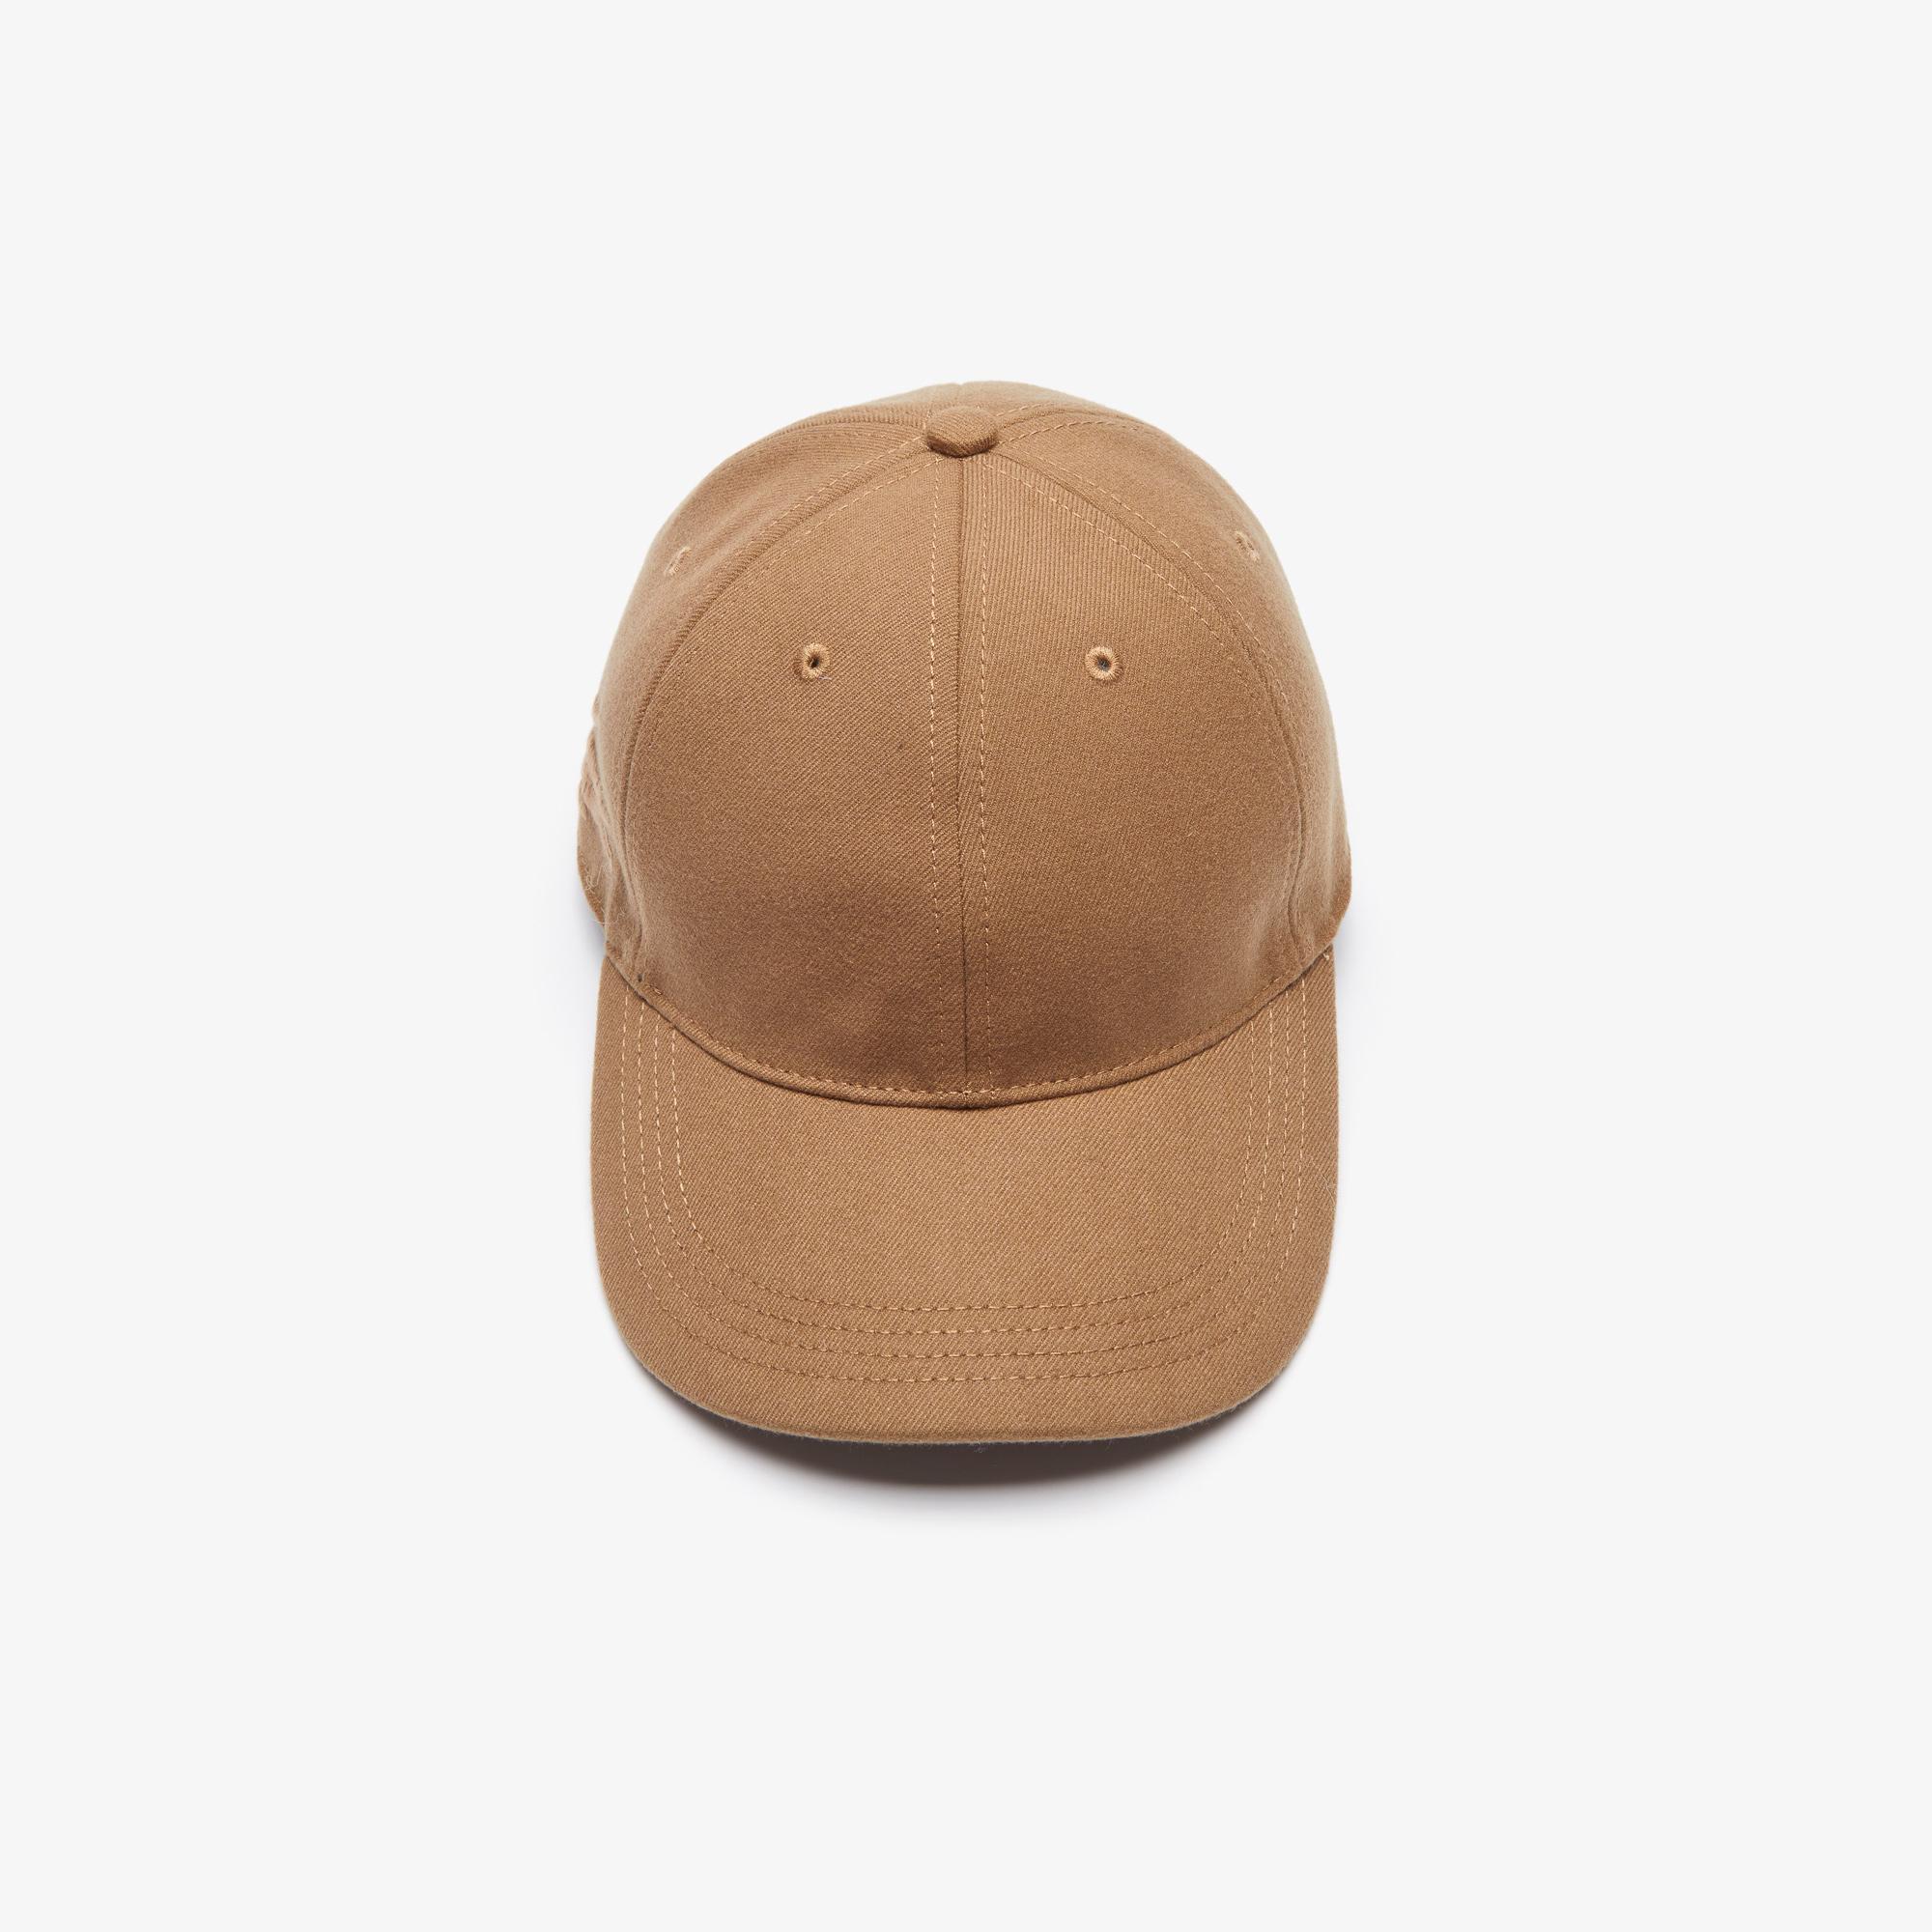 Lacoste Unisex Kahverengi Şapka